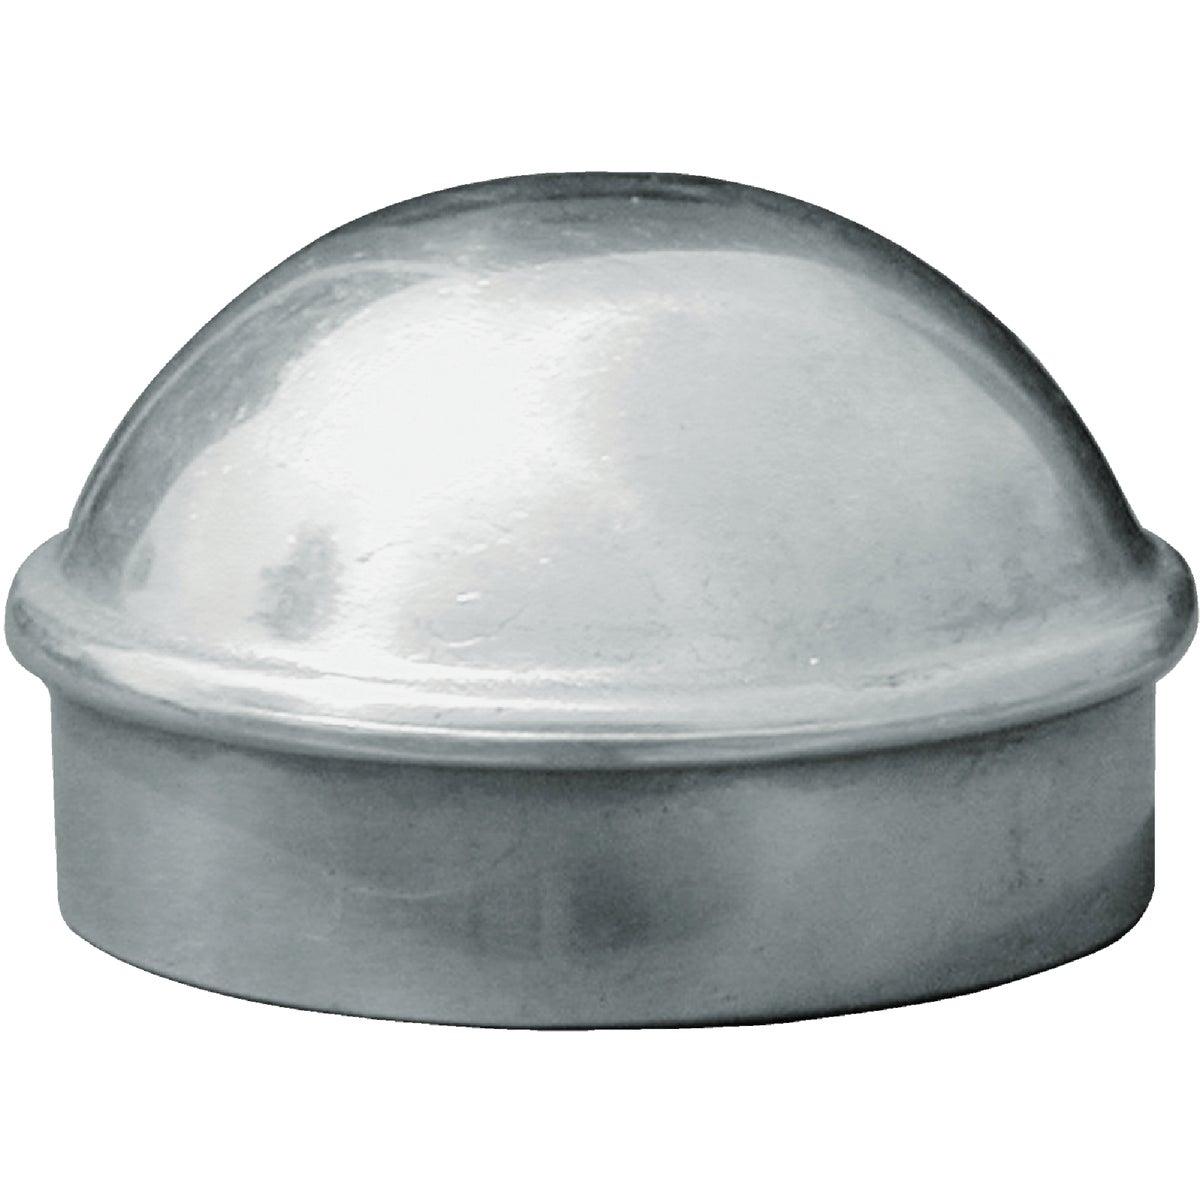 "2-3/8"" POST CAP"